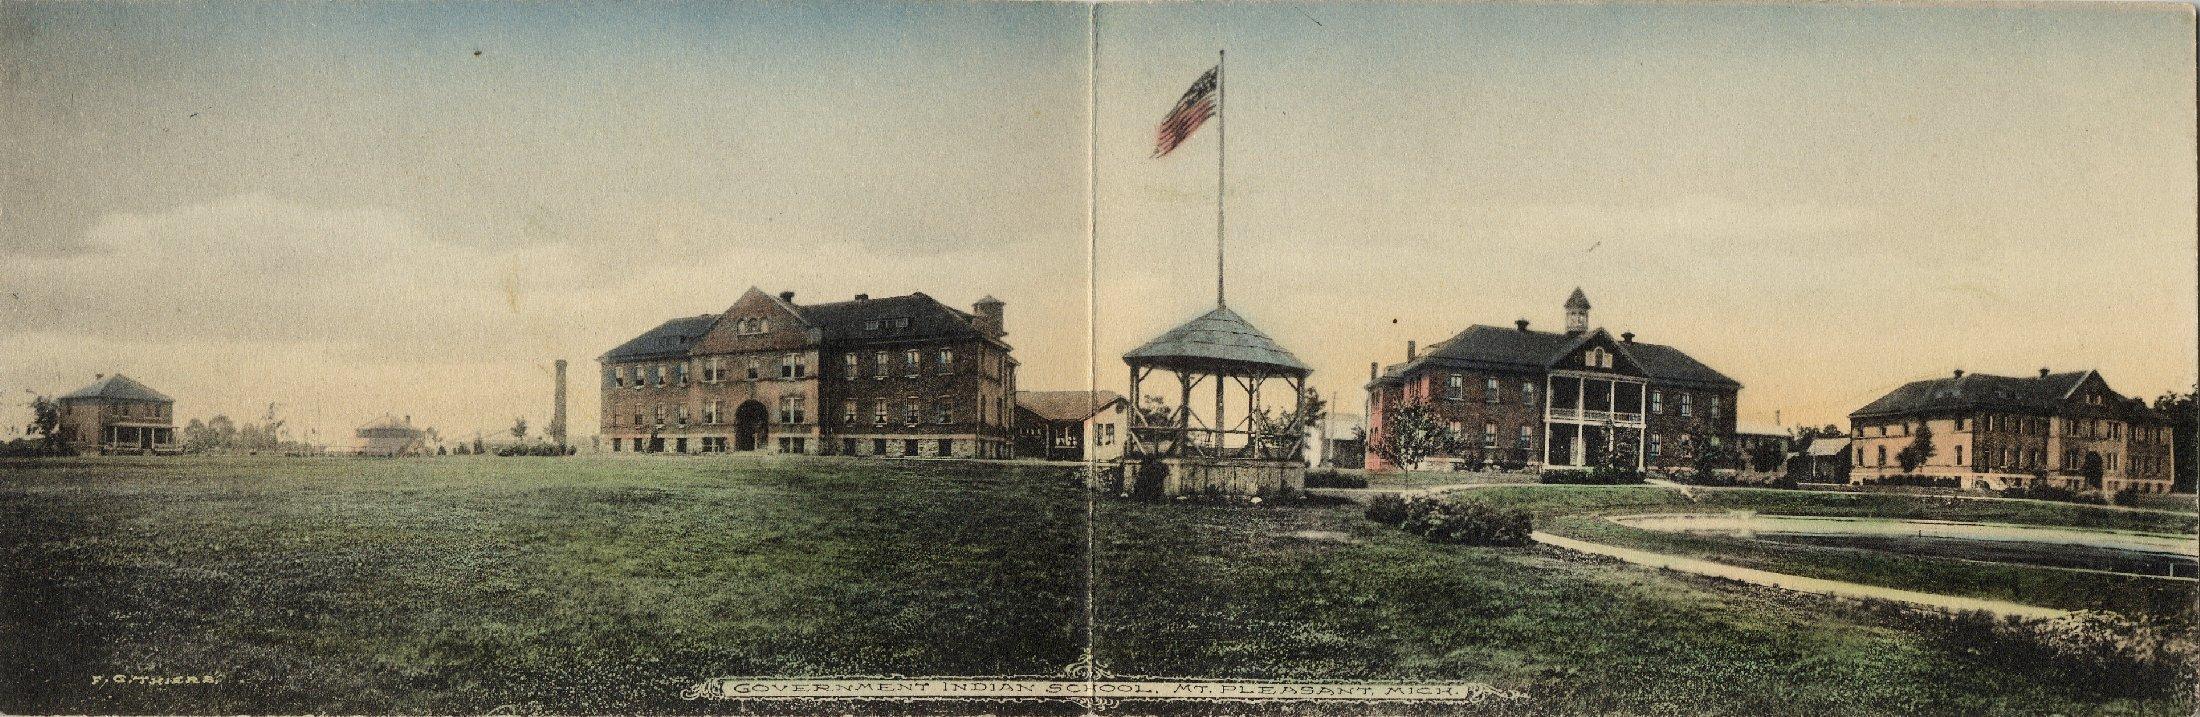 Mt Pleasant Training School Historic Asylums